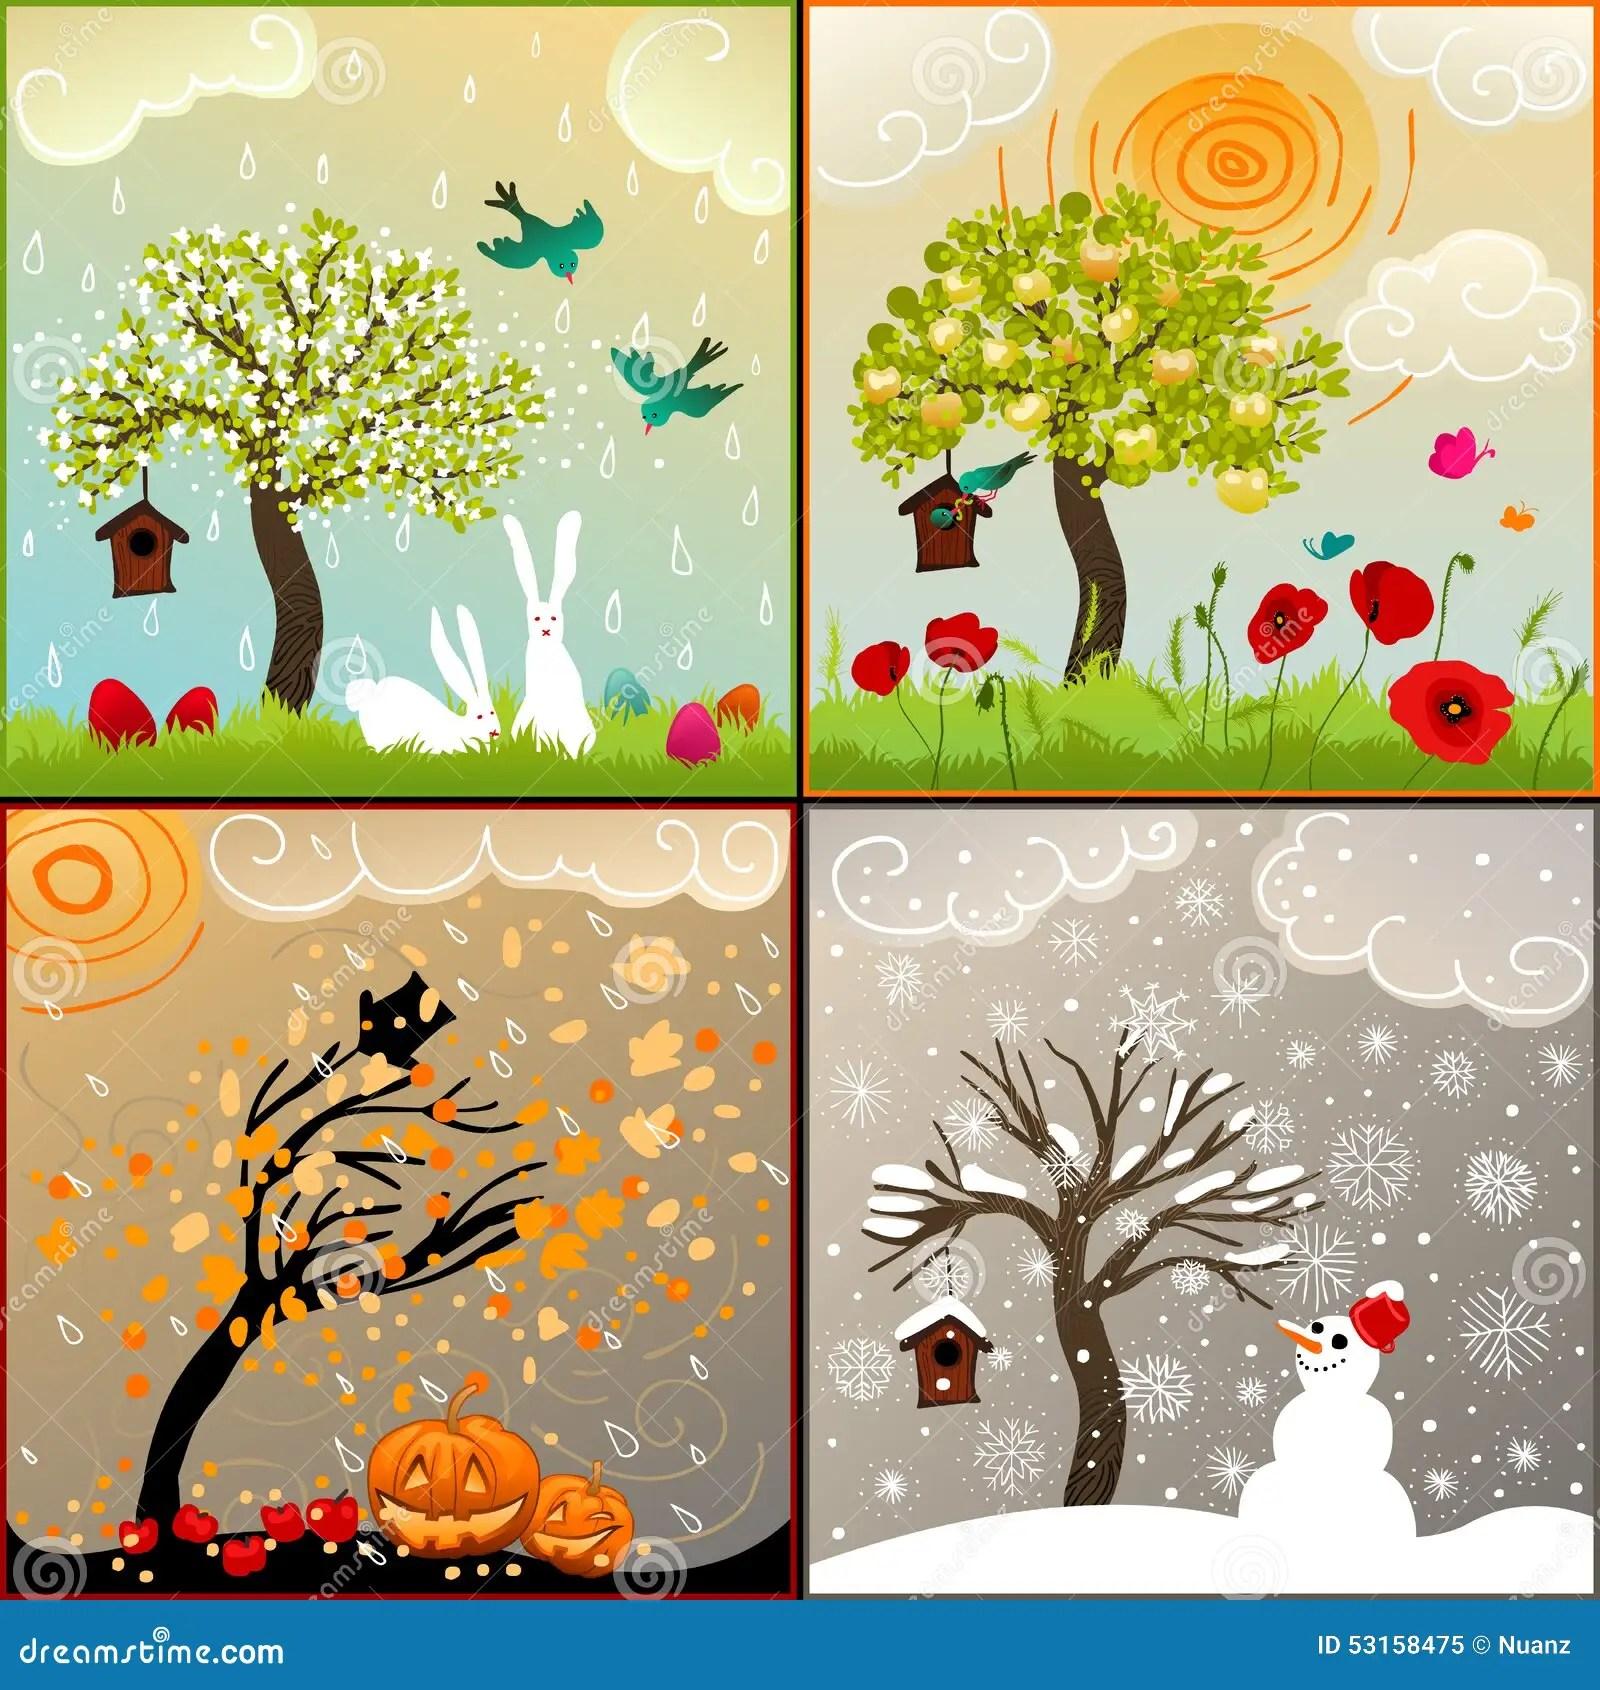 Four Seasons Themed Illustrations Set With Apple Tree